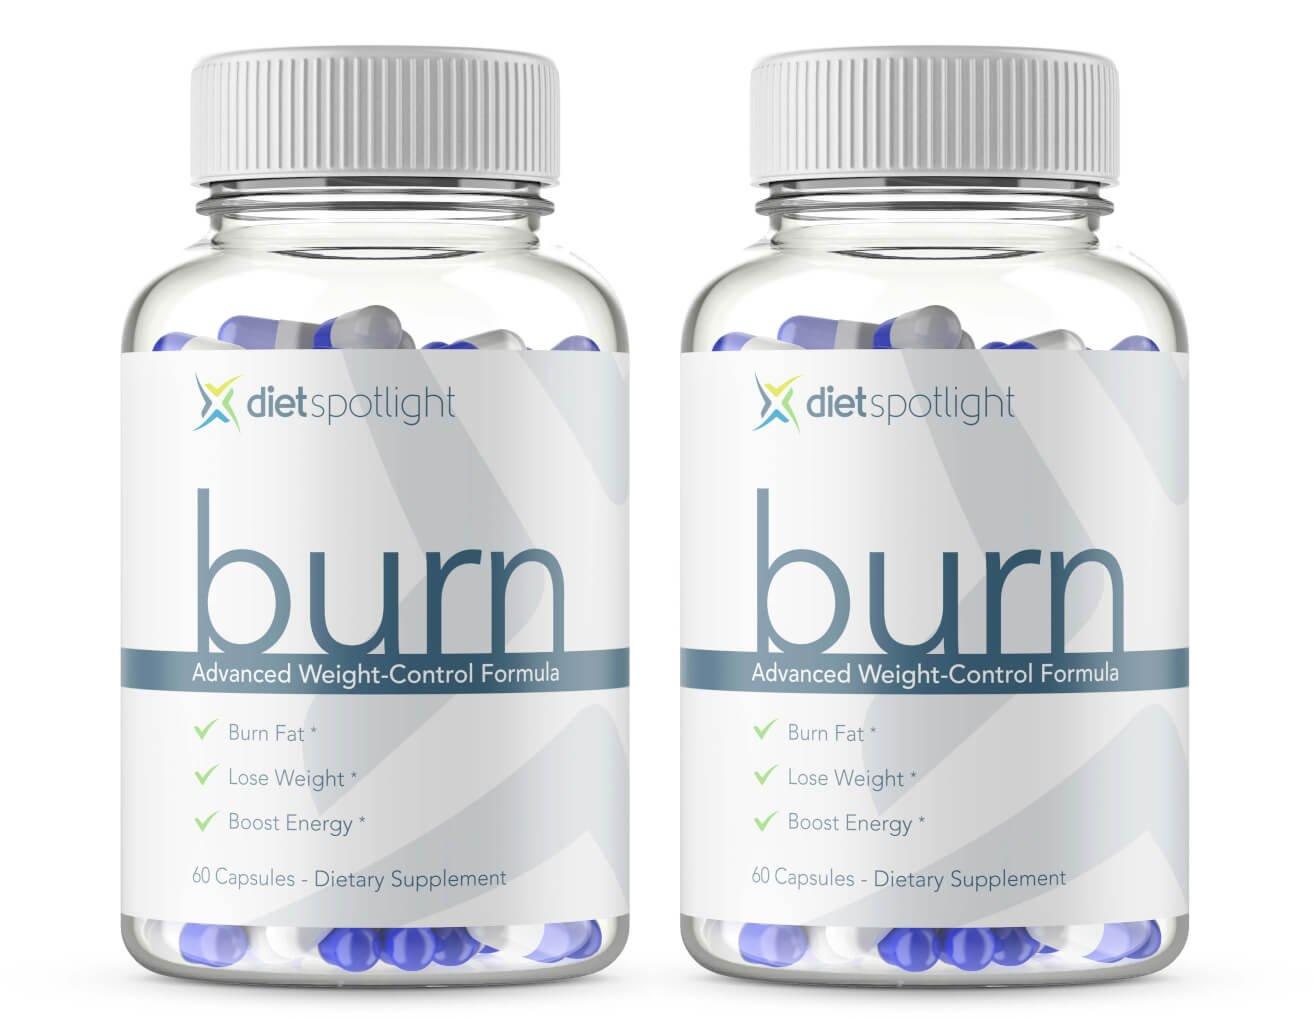 Dietspotlight Burn Weight Control Formula Plus - Increase Your Metabolism, Decrease Your Appetite, Safe & Effective Fat Burner (2-Bottle)